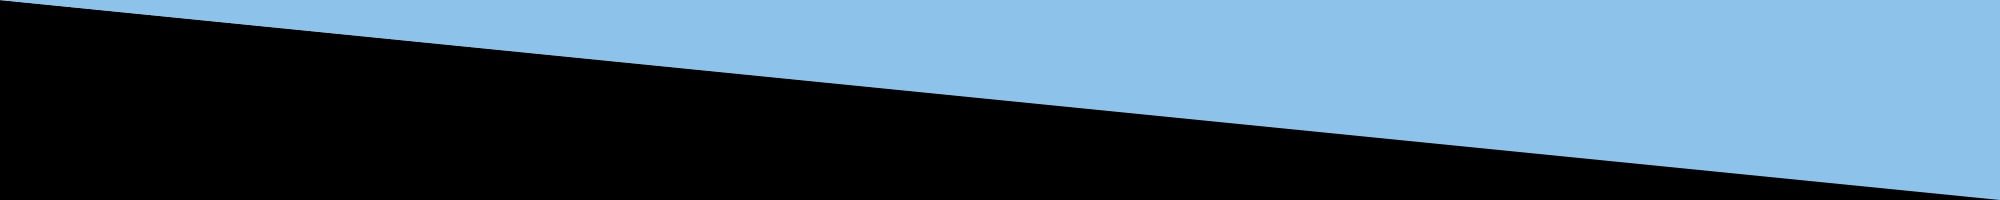 Blue to black background image